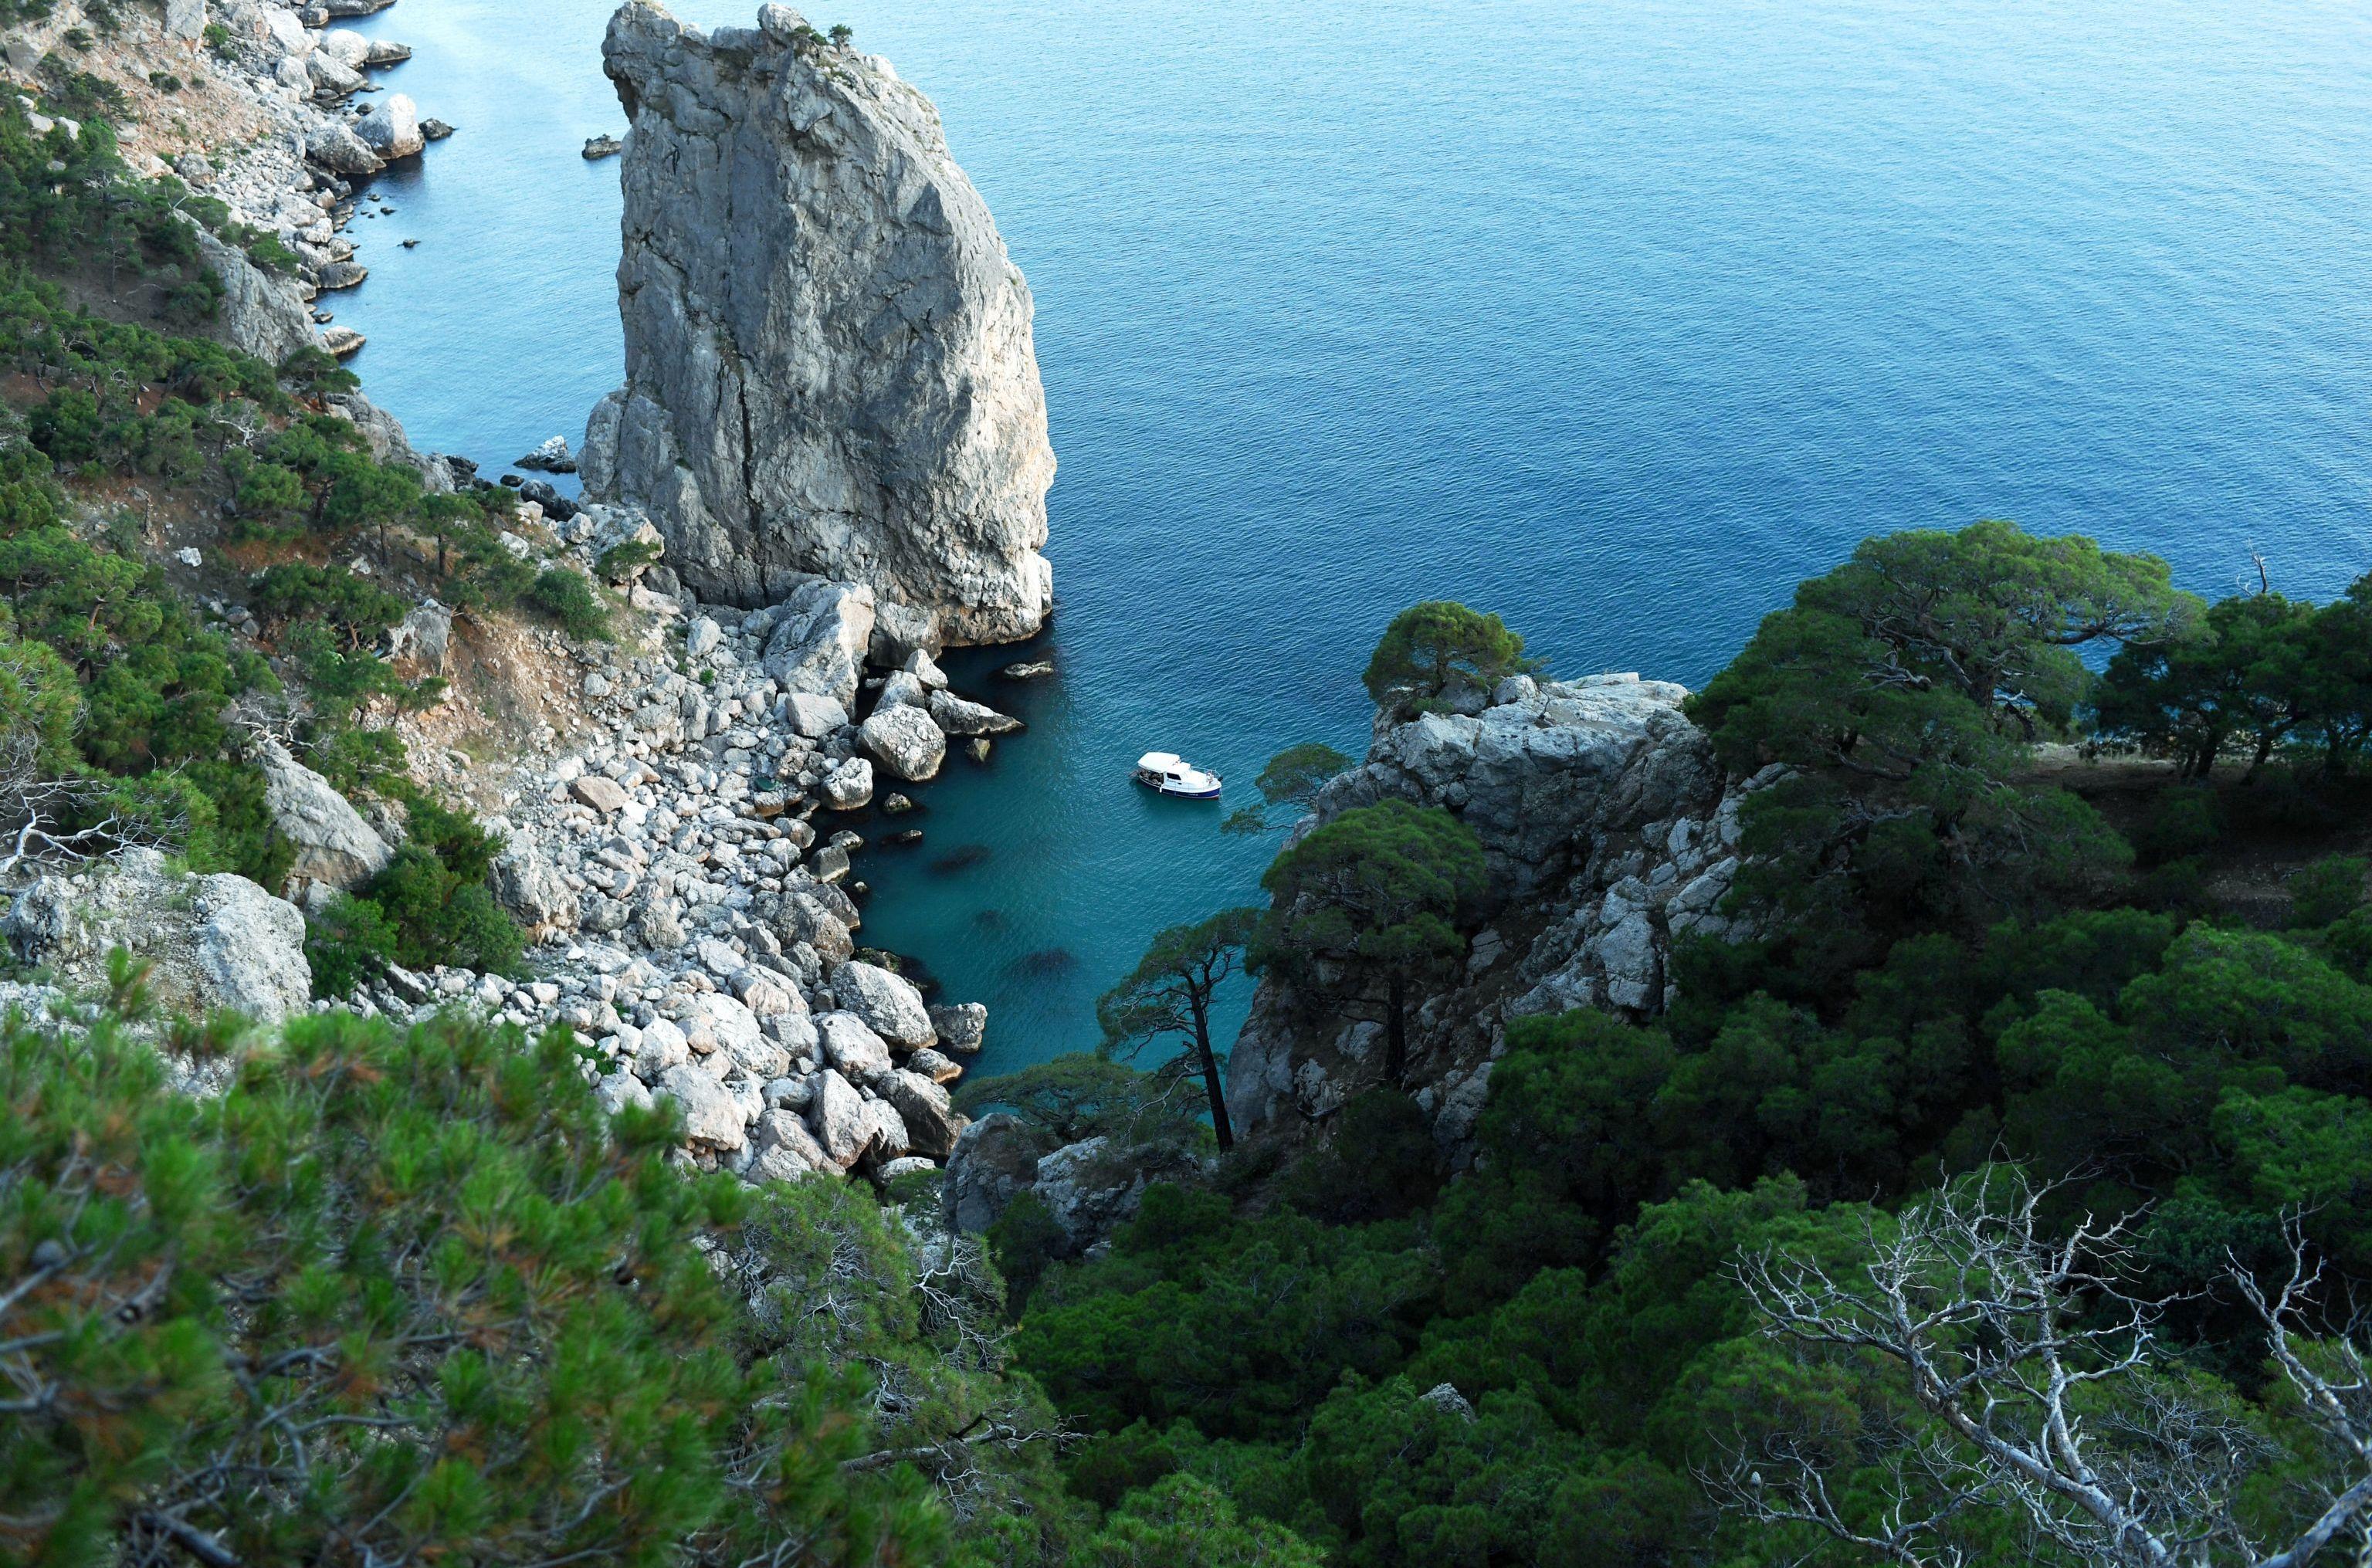 Península da Crimeia, situada na costa do mar negro